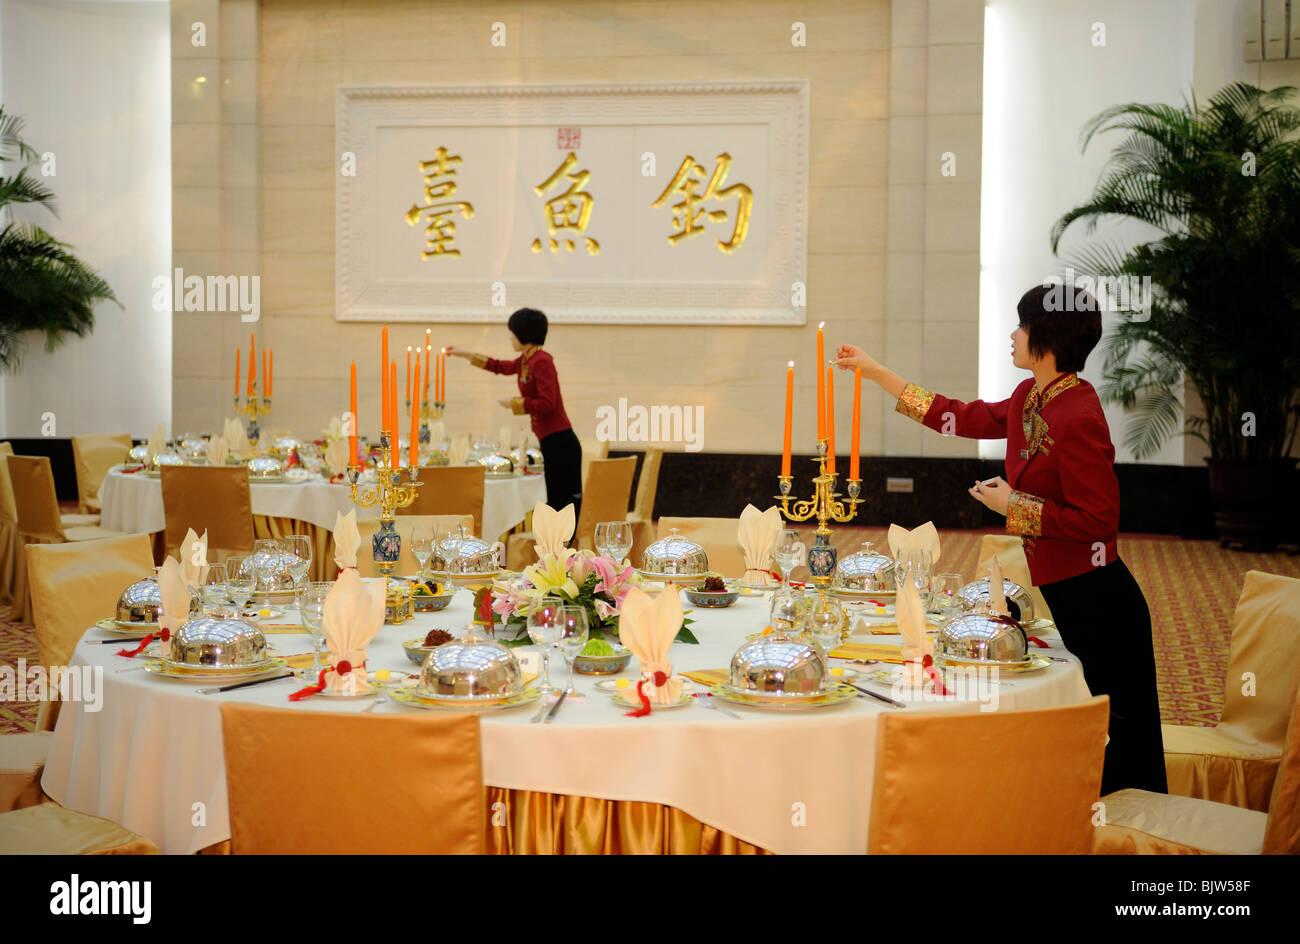 Die Diaoyutai State Guesthouse. Stockbild